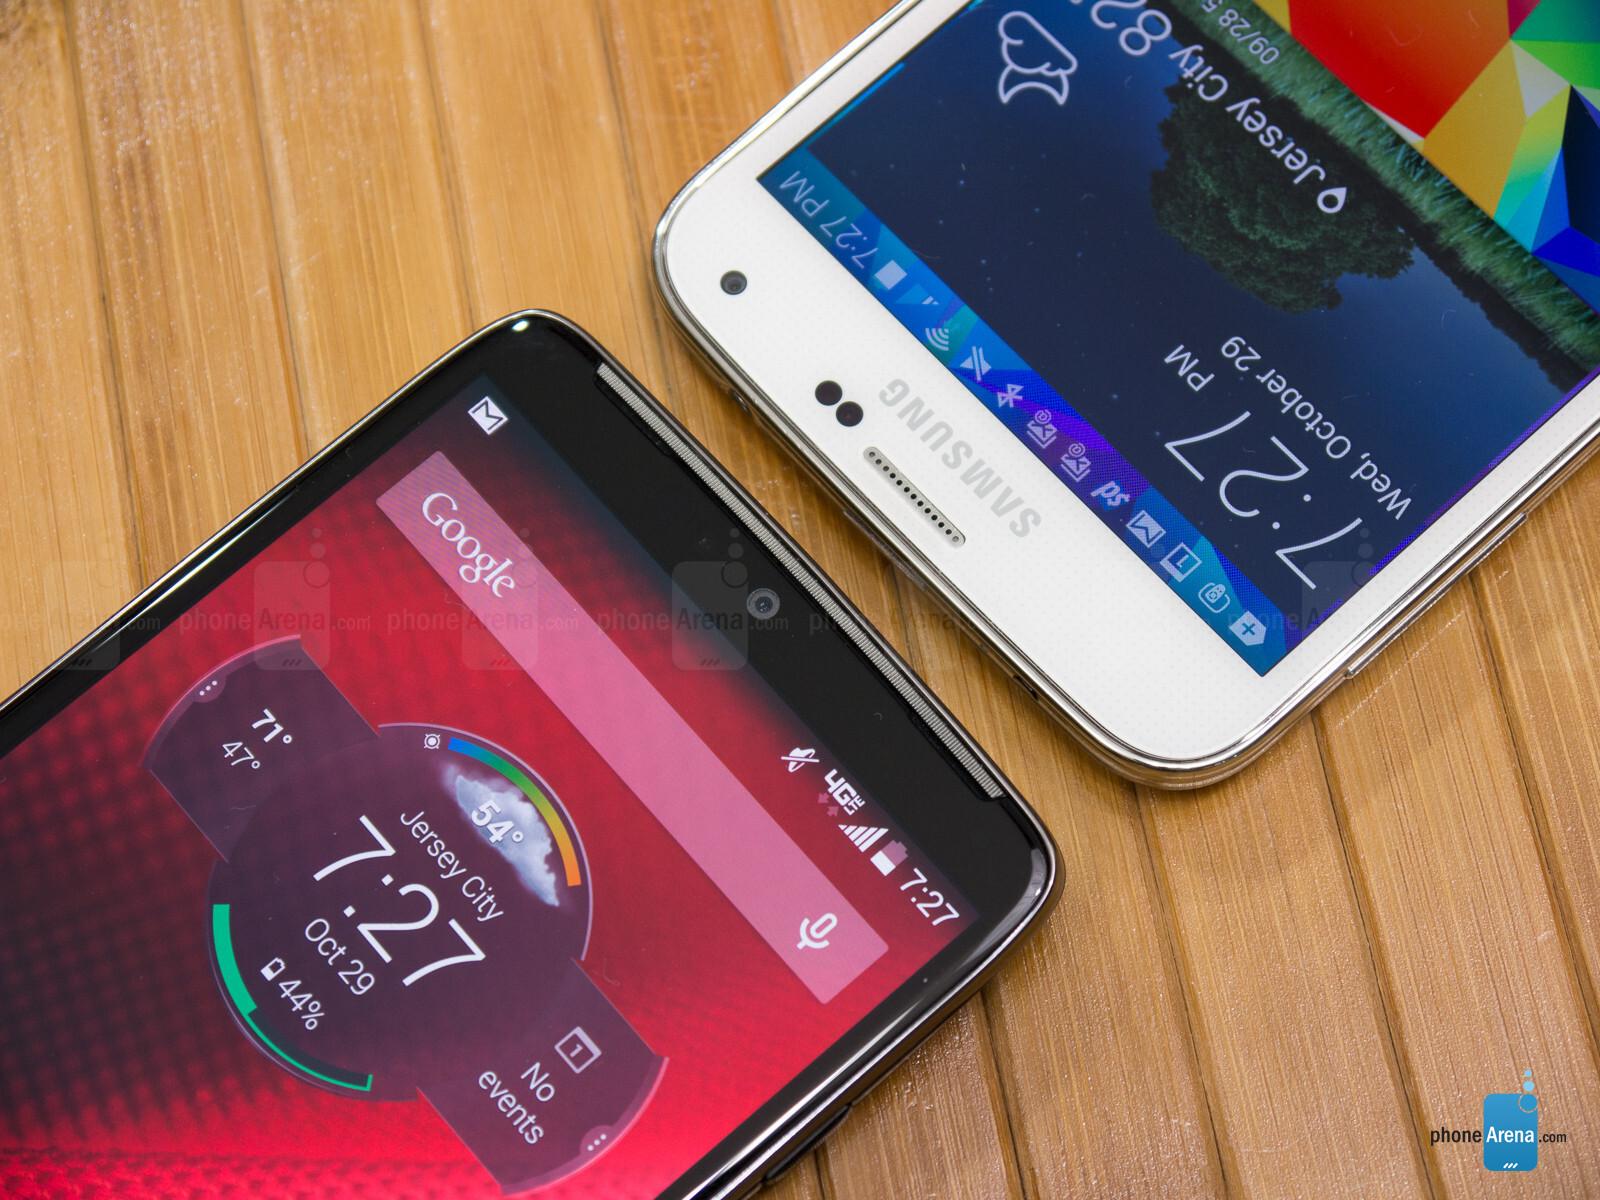 Motorola Droid Turbo Vs Samsung Galaxy S5 Phonearena